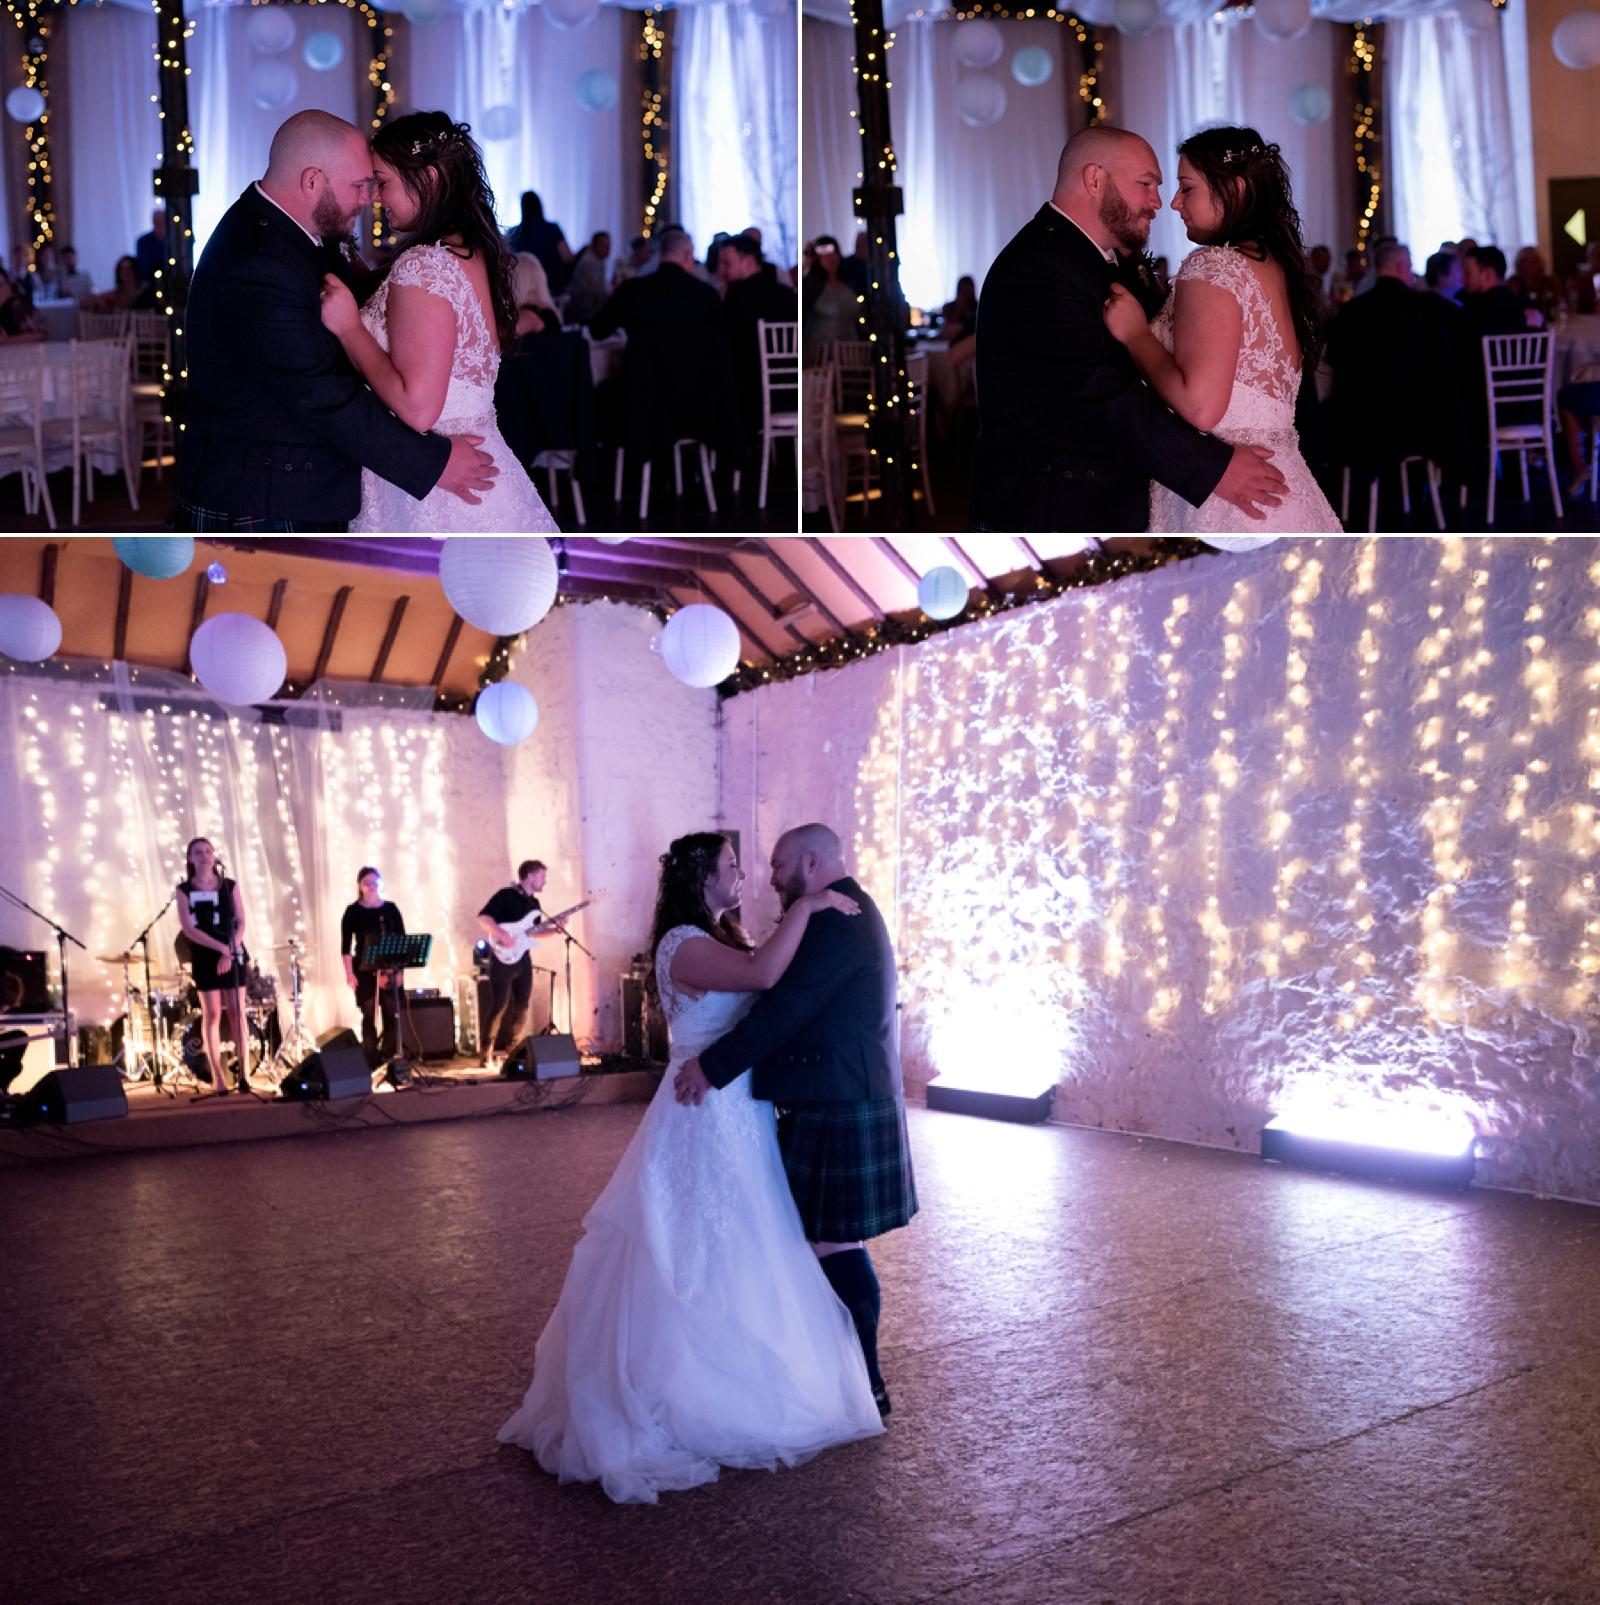 2017-09-23 (Mearns) Pratis Farm Wedding Photography200837-2.jpg